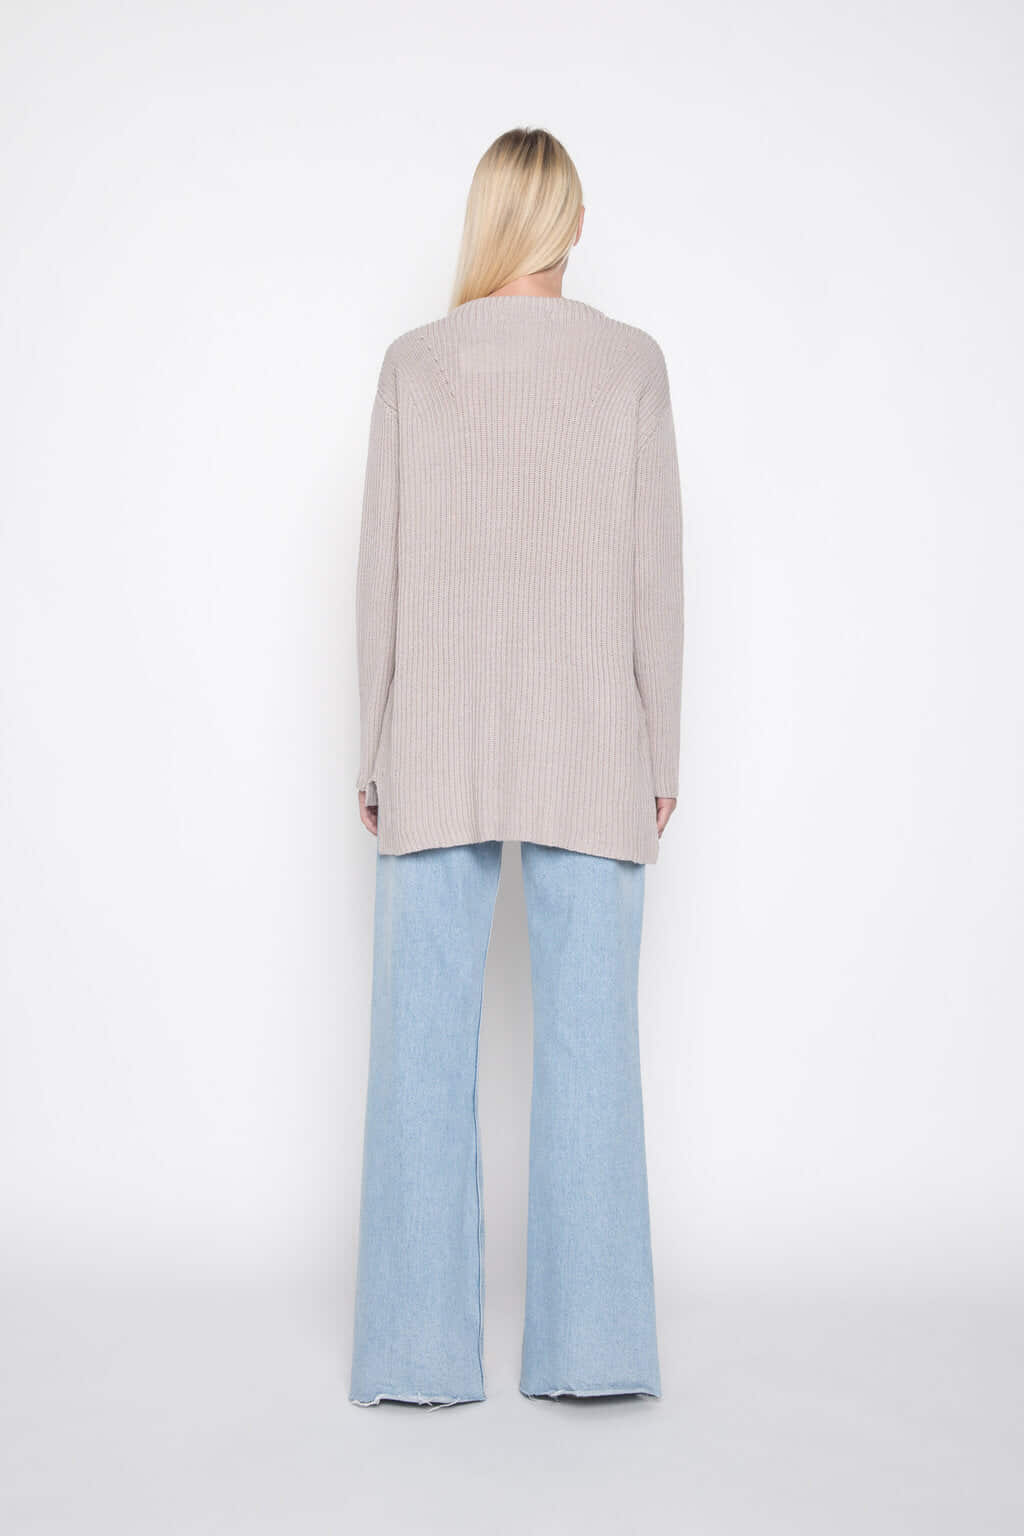 Sweater 1016 Beige 4